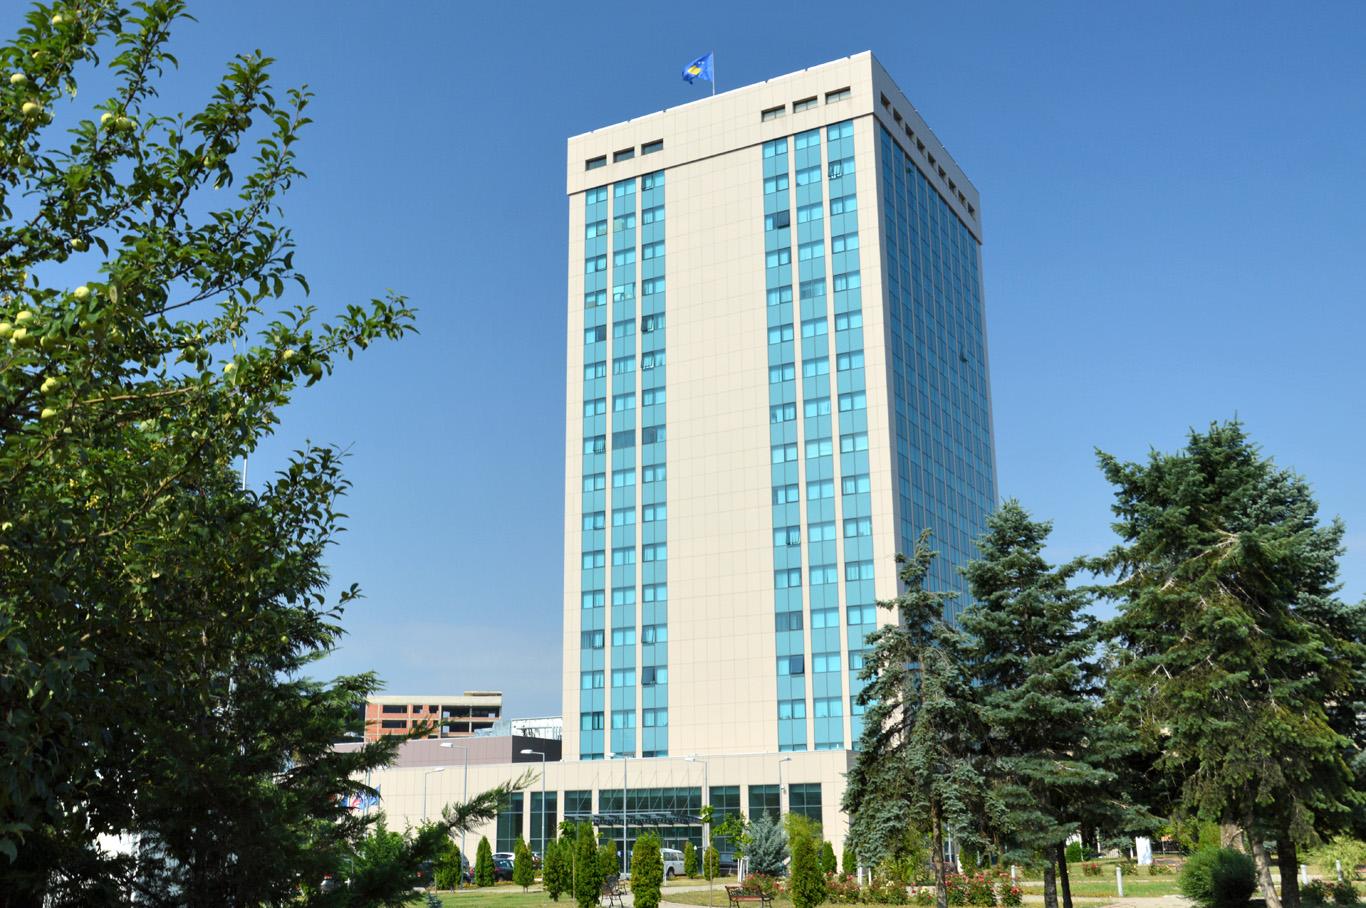 Kosovo Government building